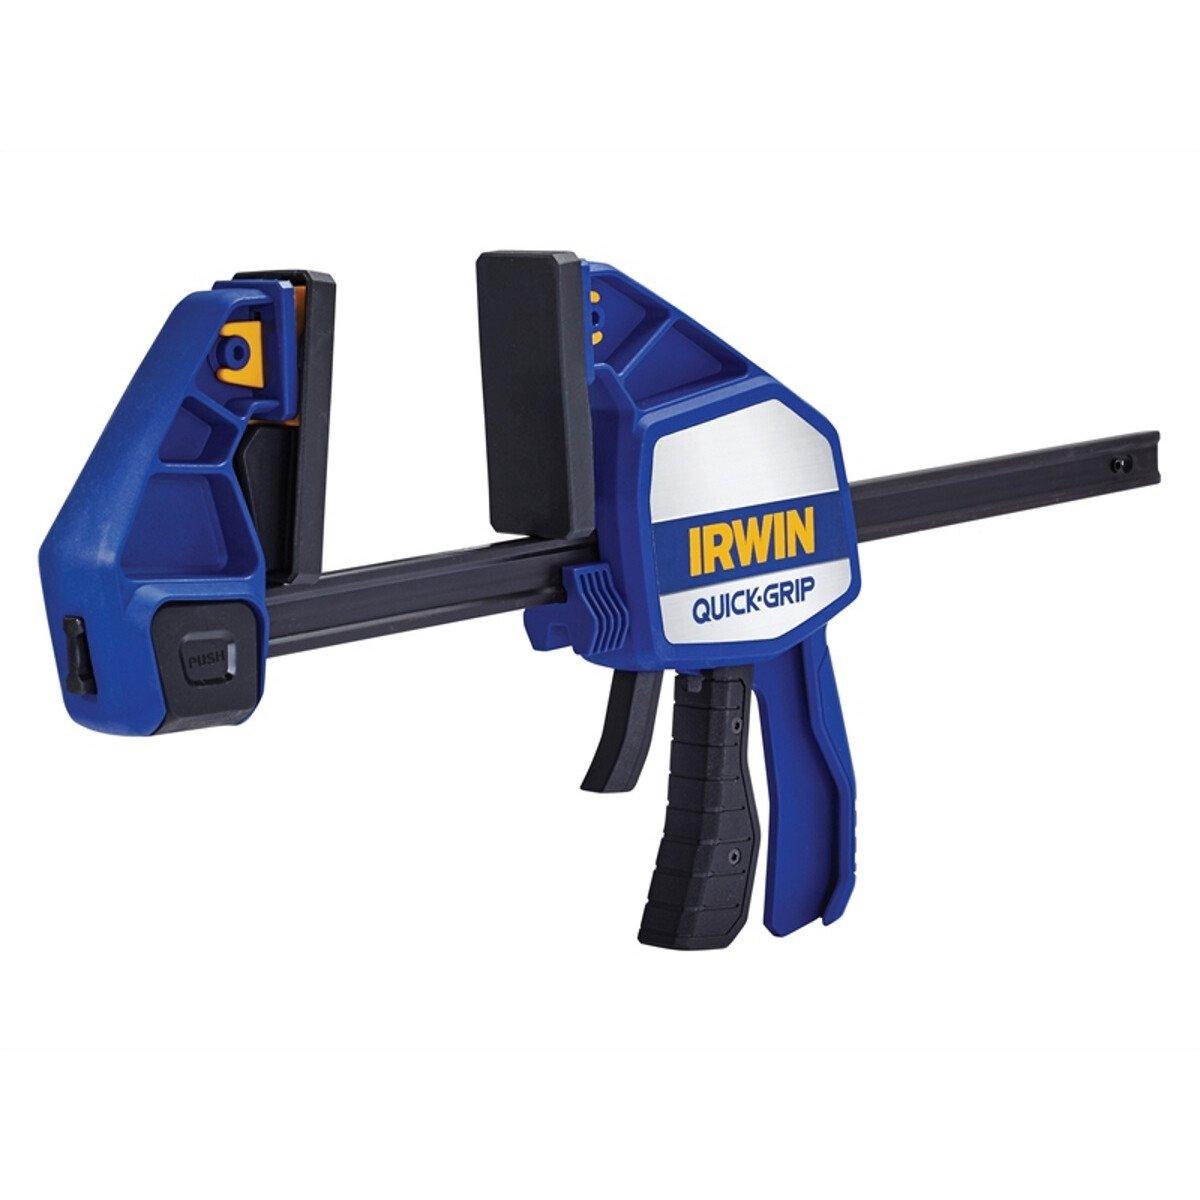 "Irwin Quick-Grip 10505943 IRWIN QUICK-GRIP XP PRO OHBC 300mm (12"") Quickgrip Q/GXP12"